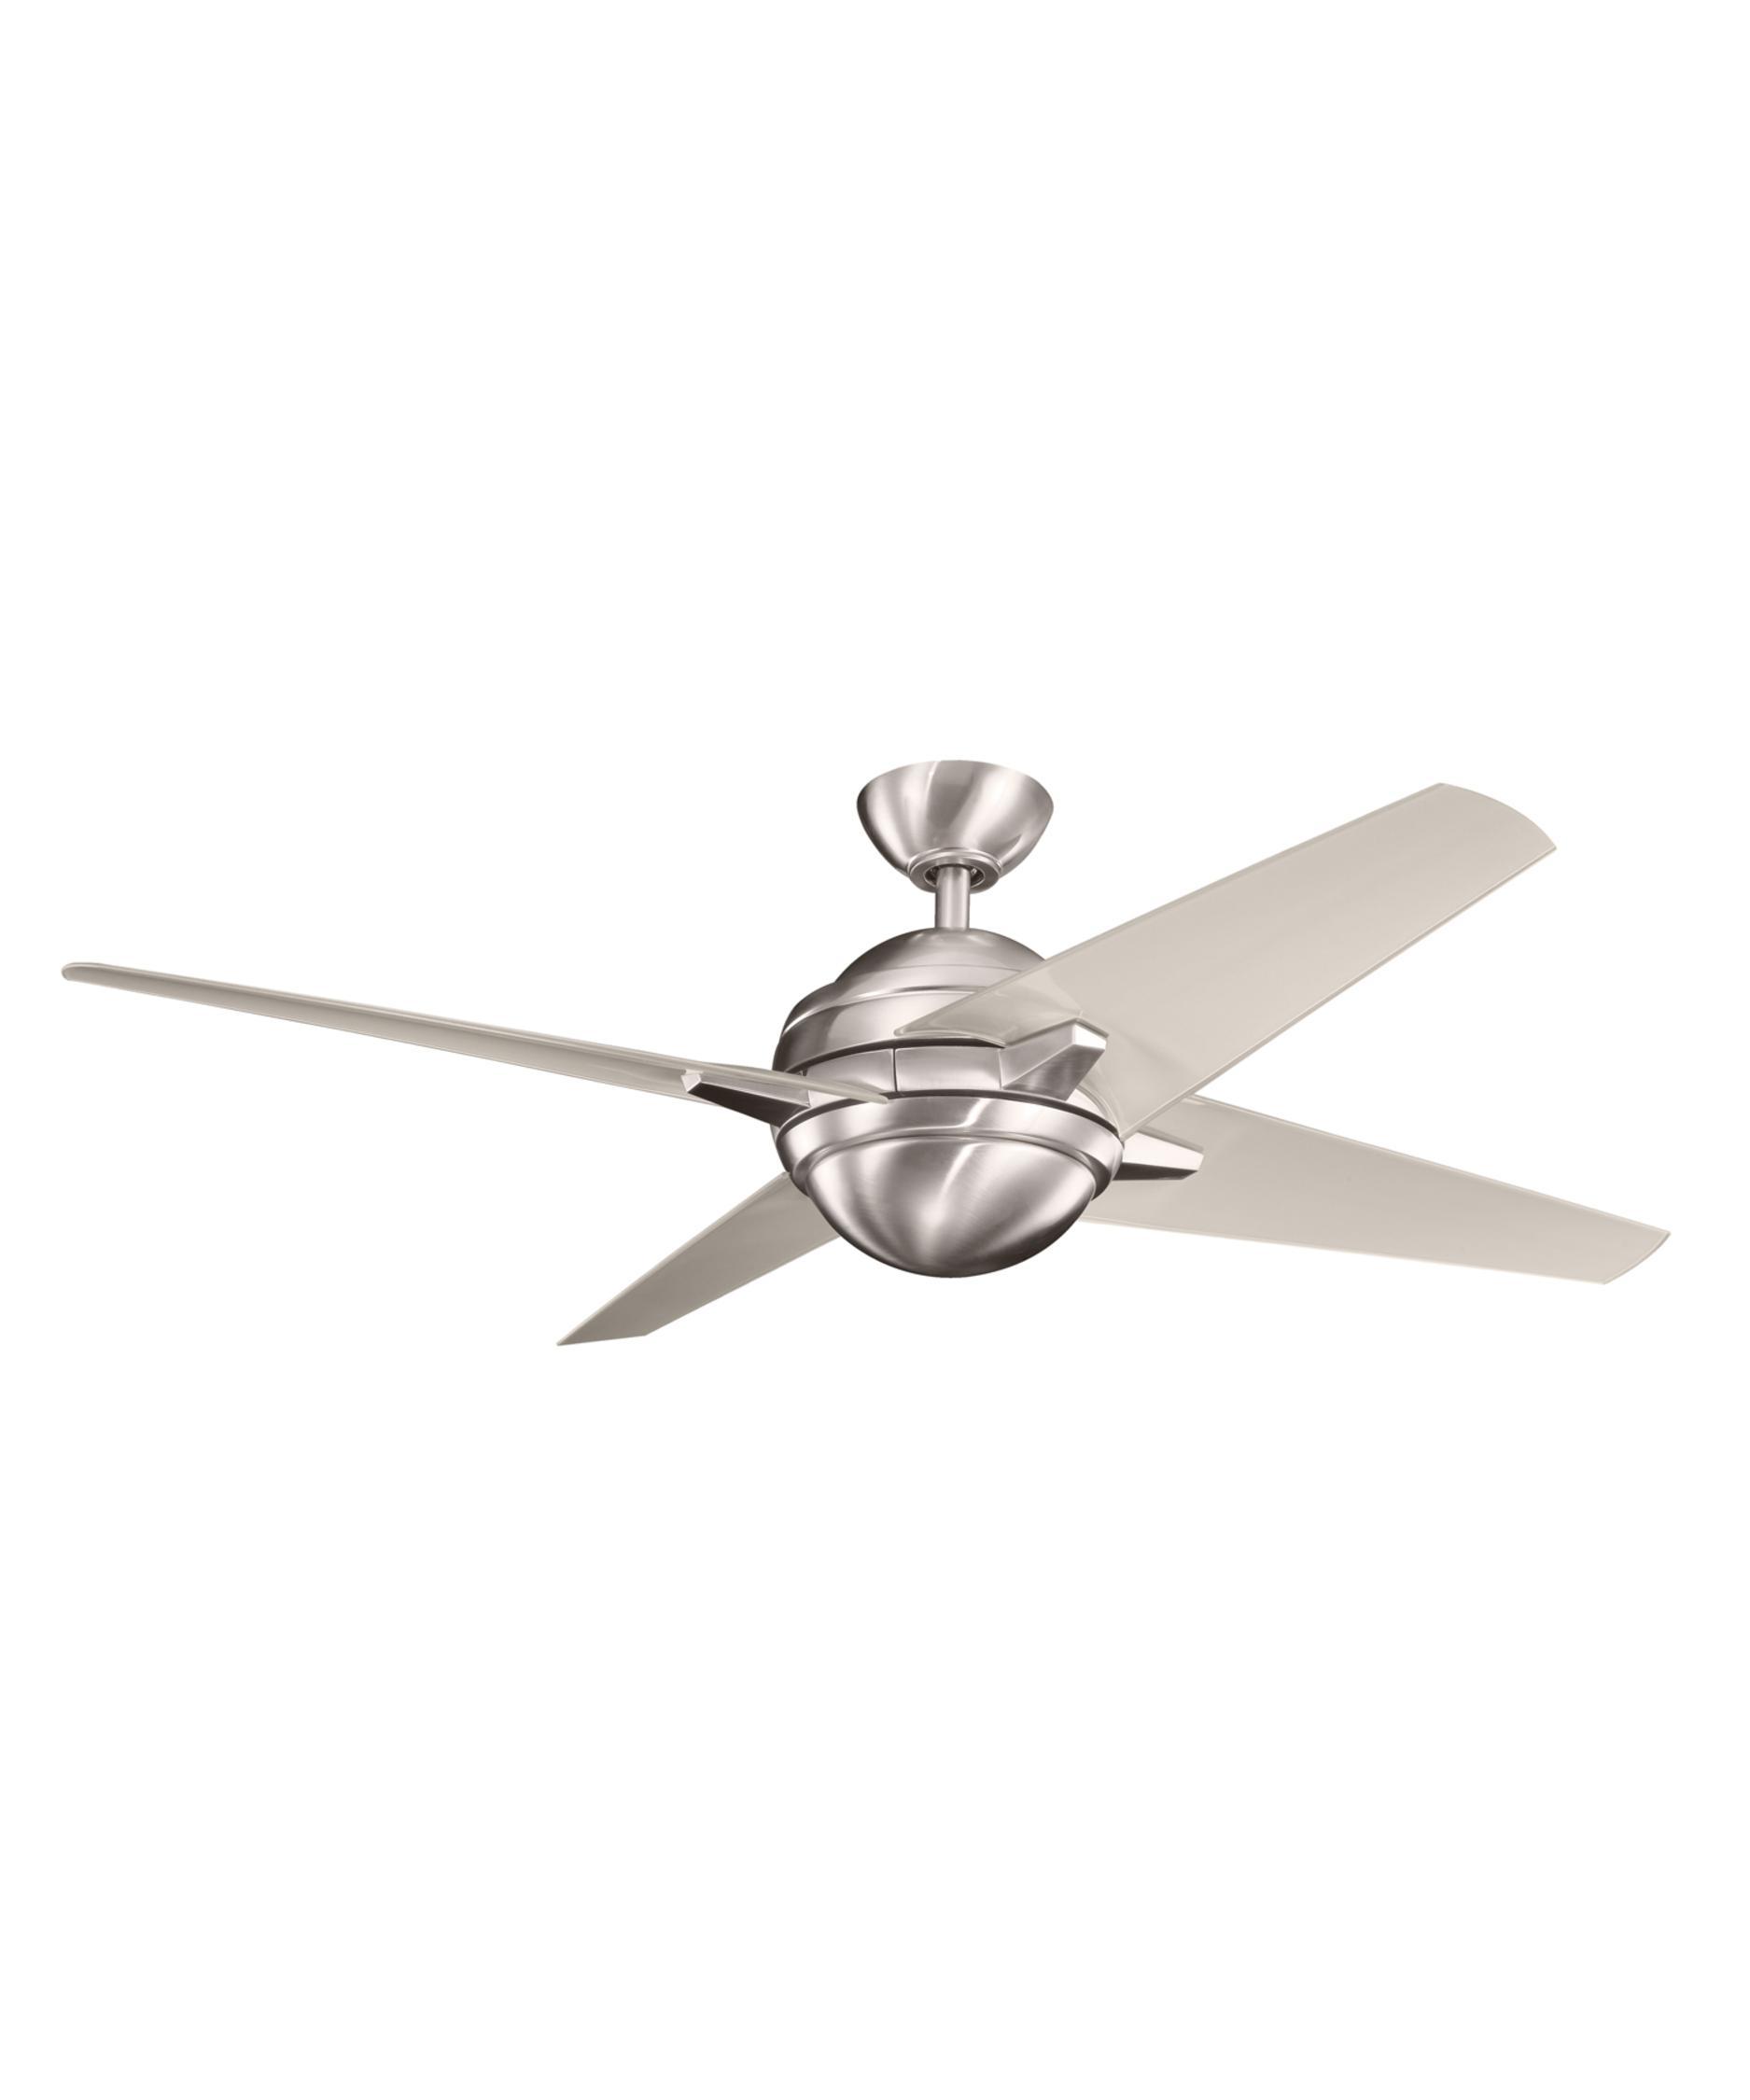 kichler 300133 rivetta 52 inch 4 blade ceiling fan | capitol